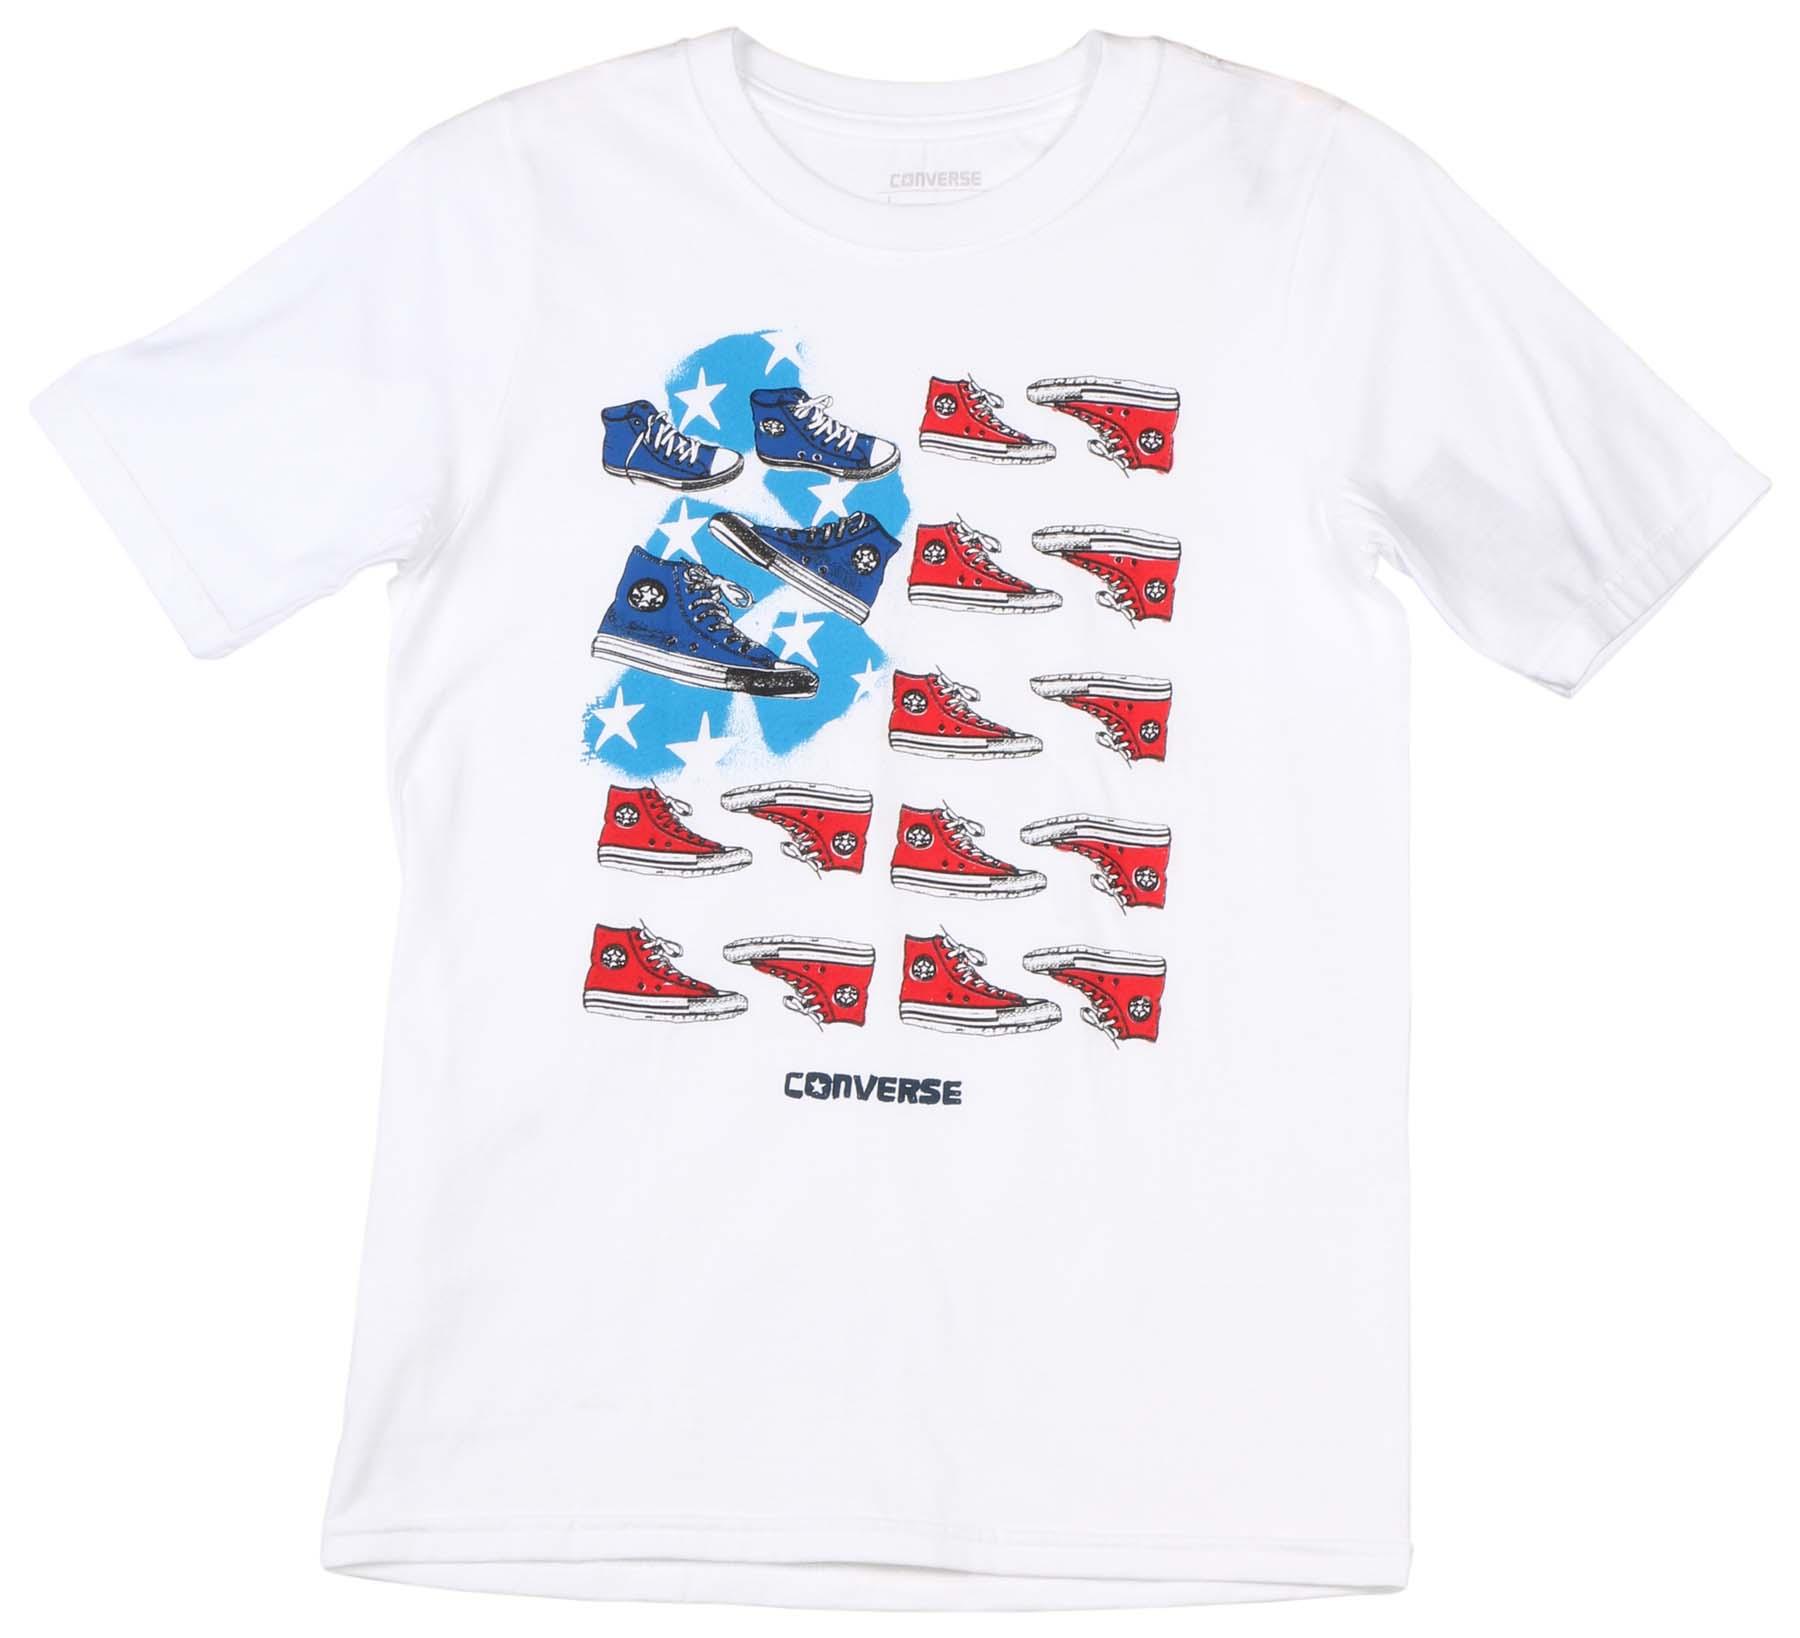 15dc06763d0a Converse Big Boys  (8-20) Chucks   Stripes T-Shirt-White